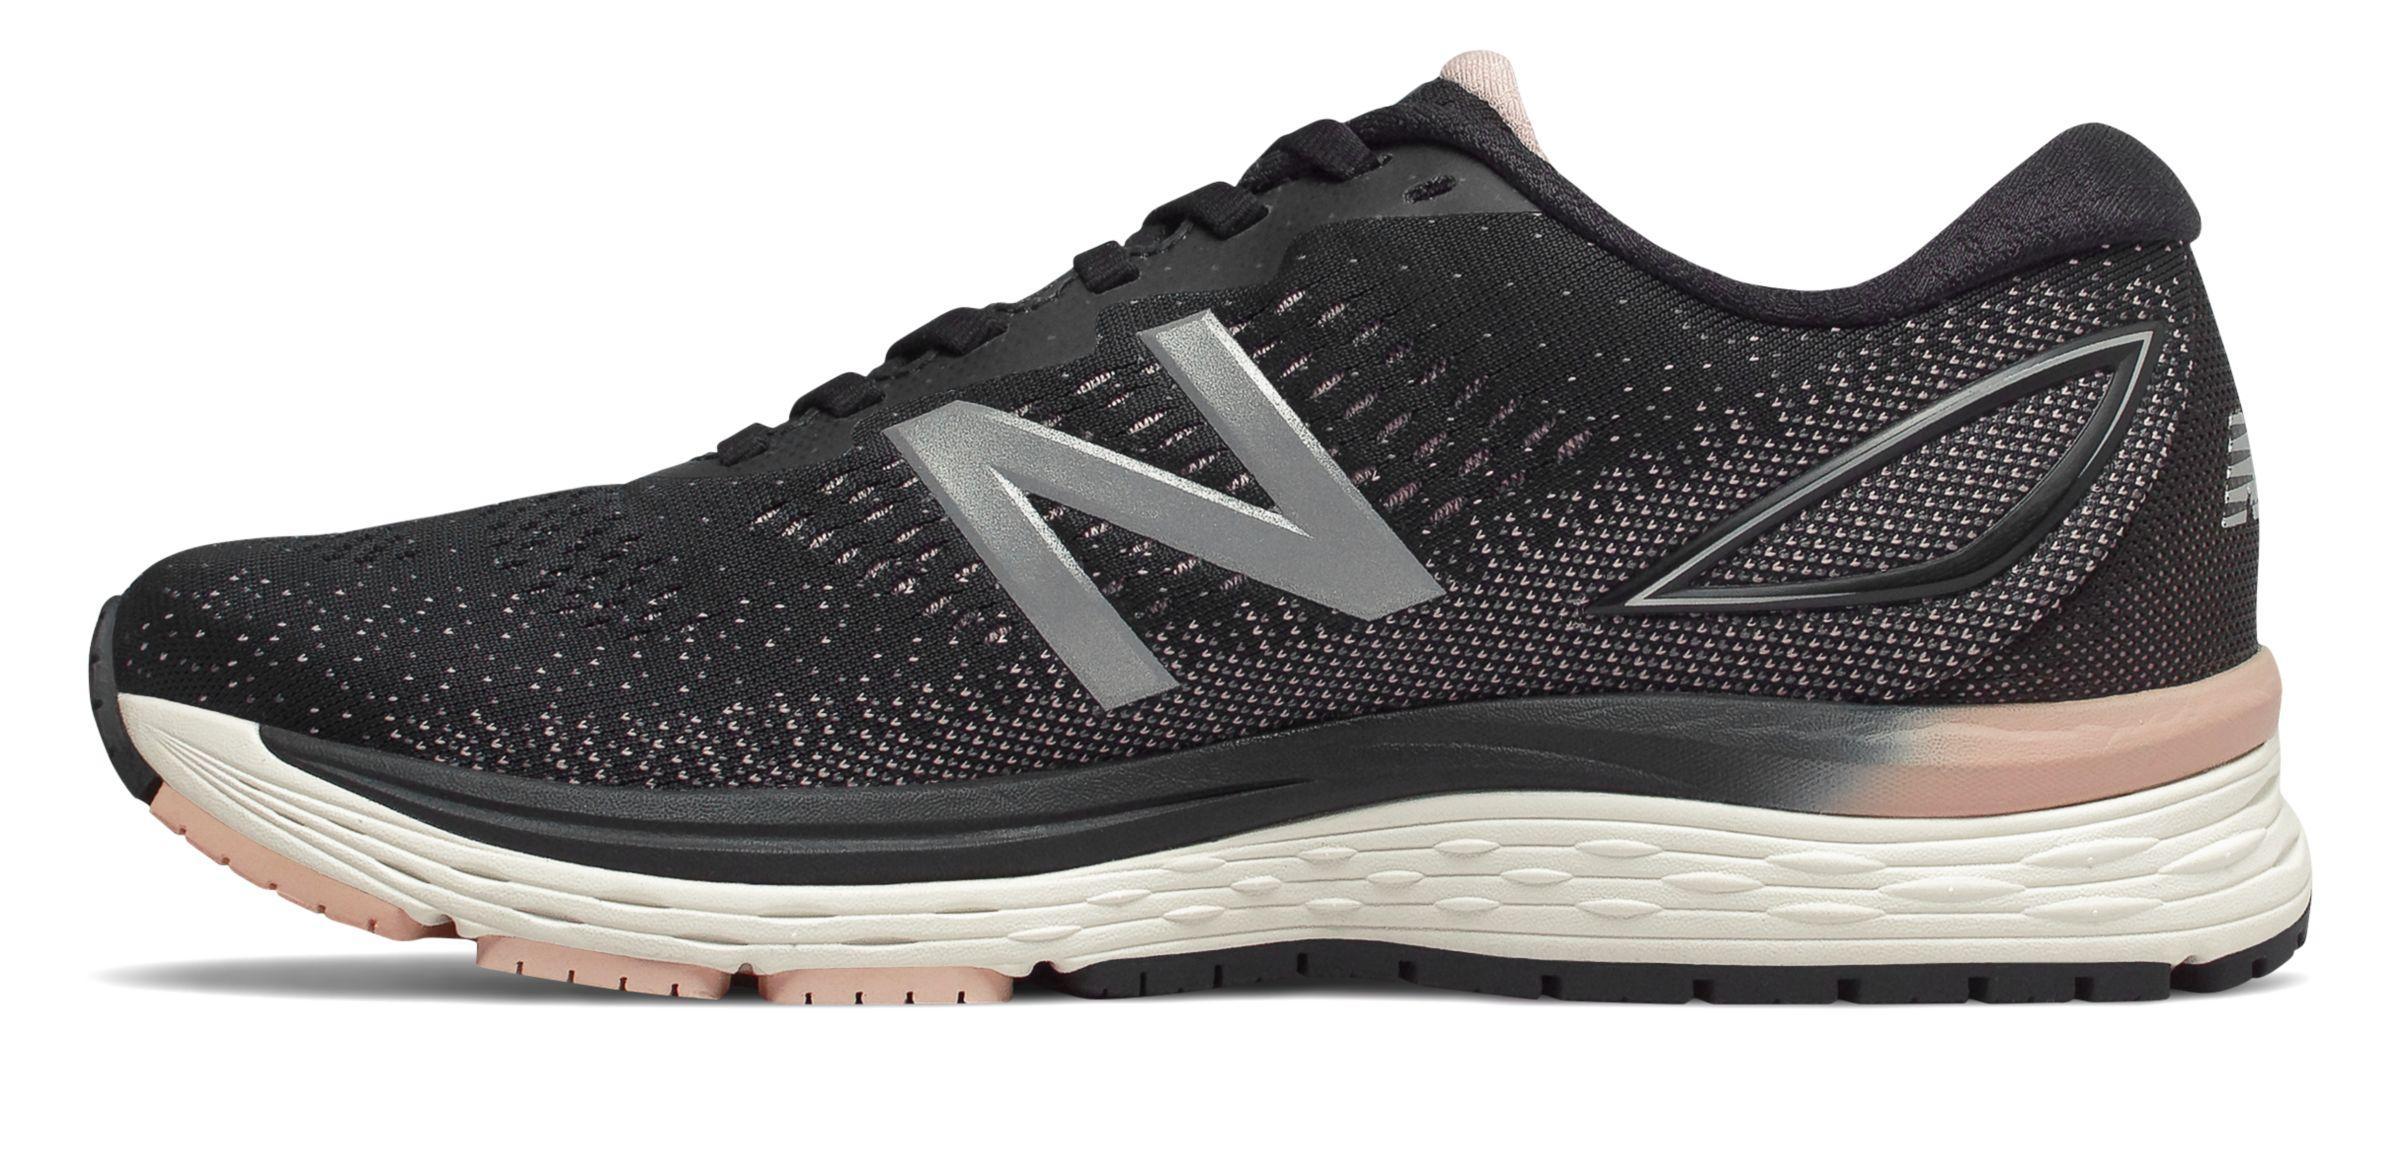 New Balance 880v9 Gtx Running Trainers